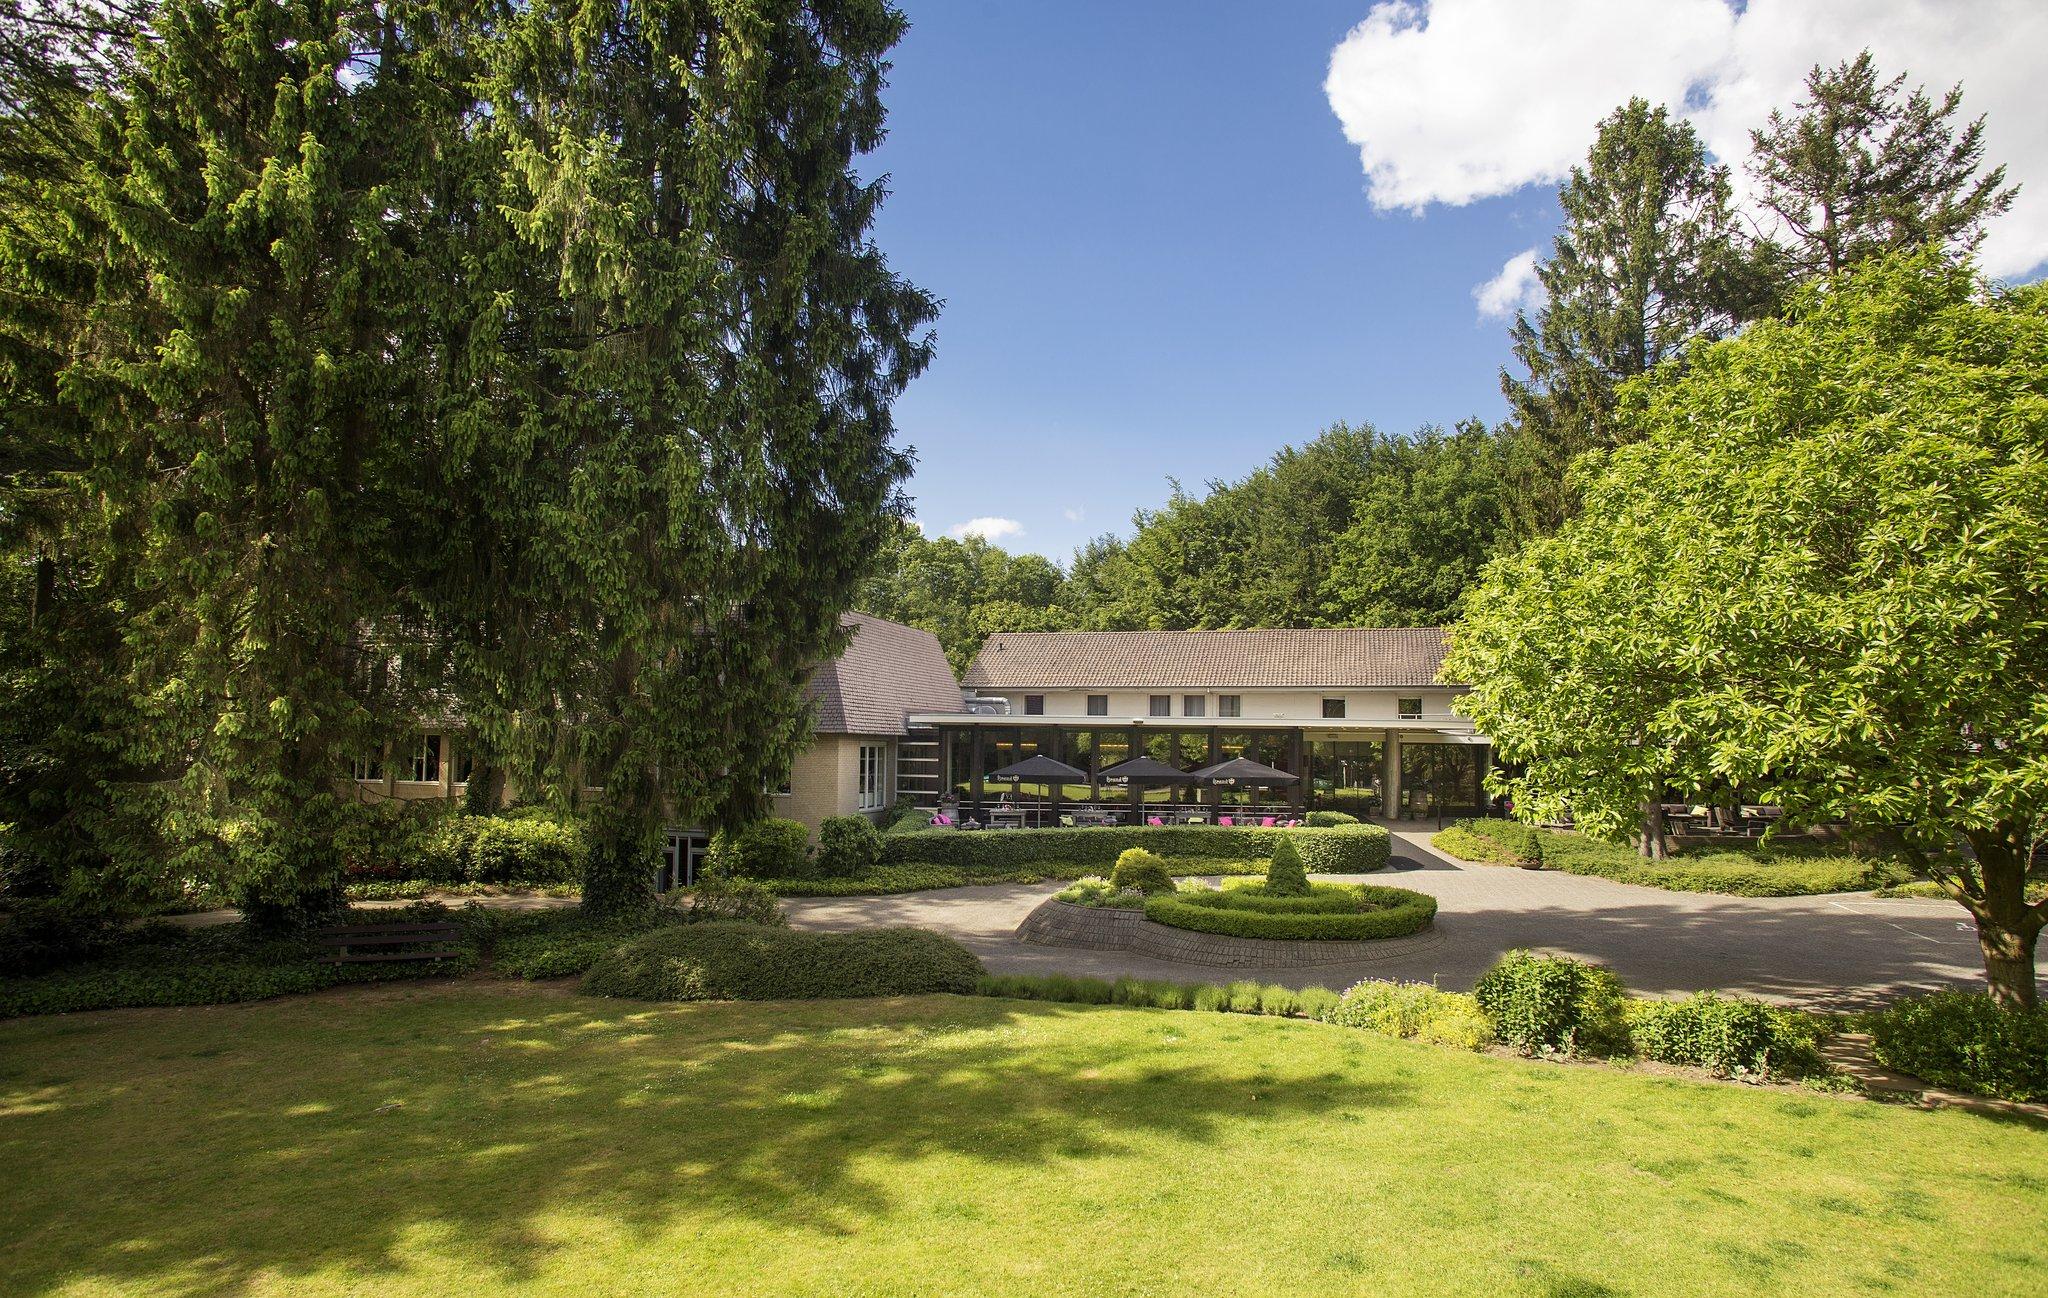 Bilderberg Hotel T'Speulderbos